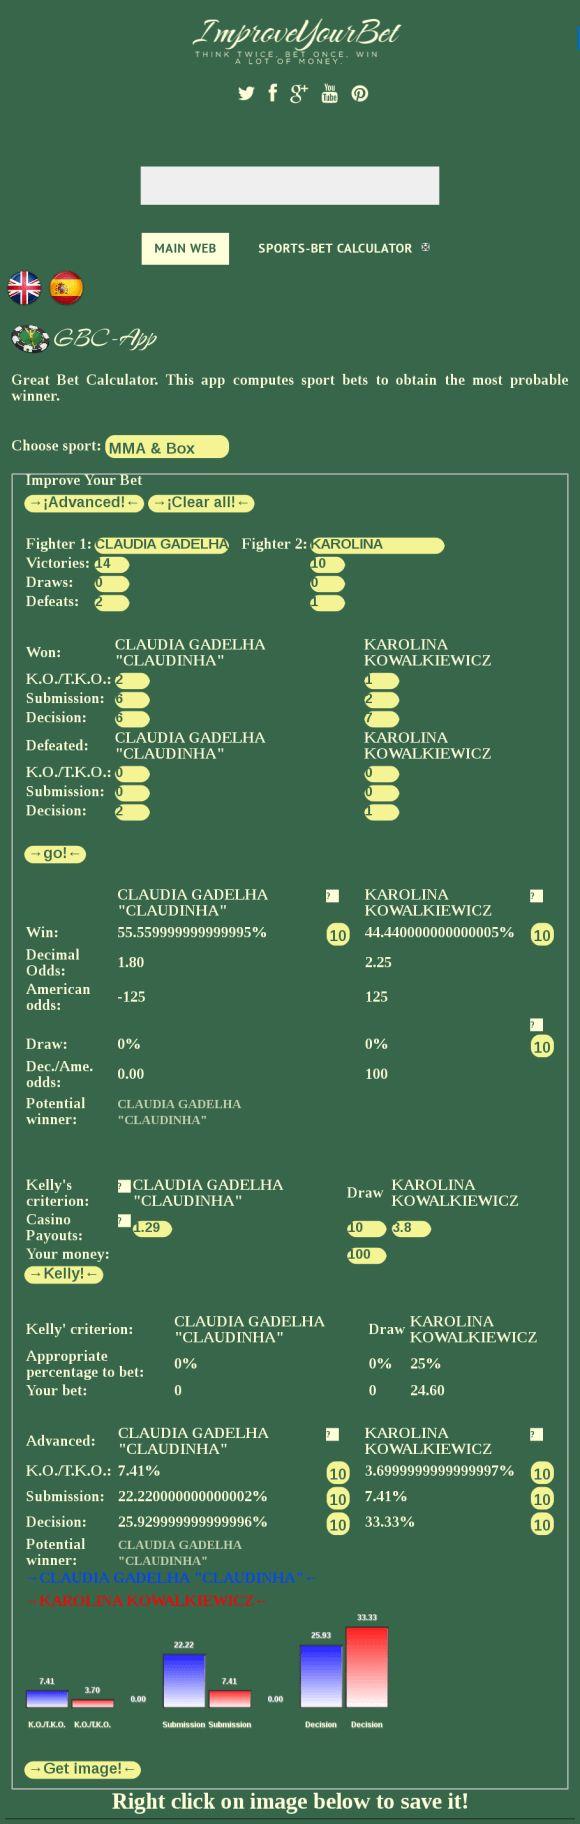 UFC 212 forecast predictions and picks CLAUDIA GADELHA CLAUDINHA Vs KAROLINA KOWALKIEWICZ